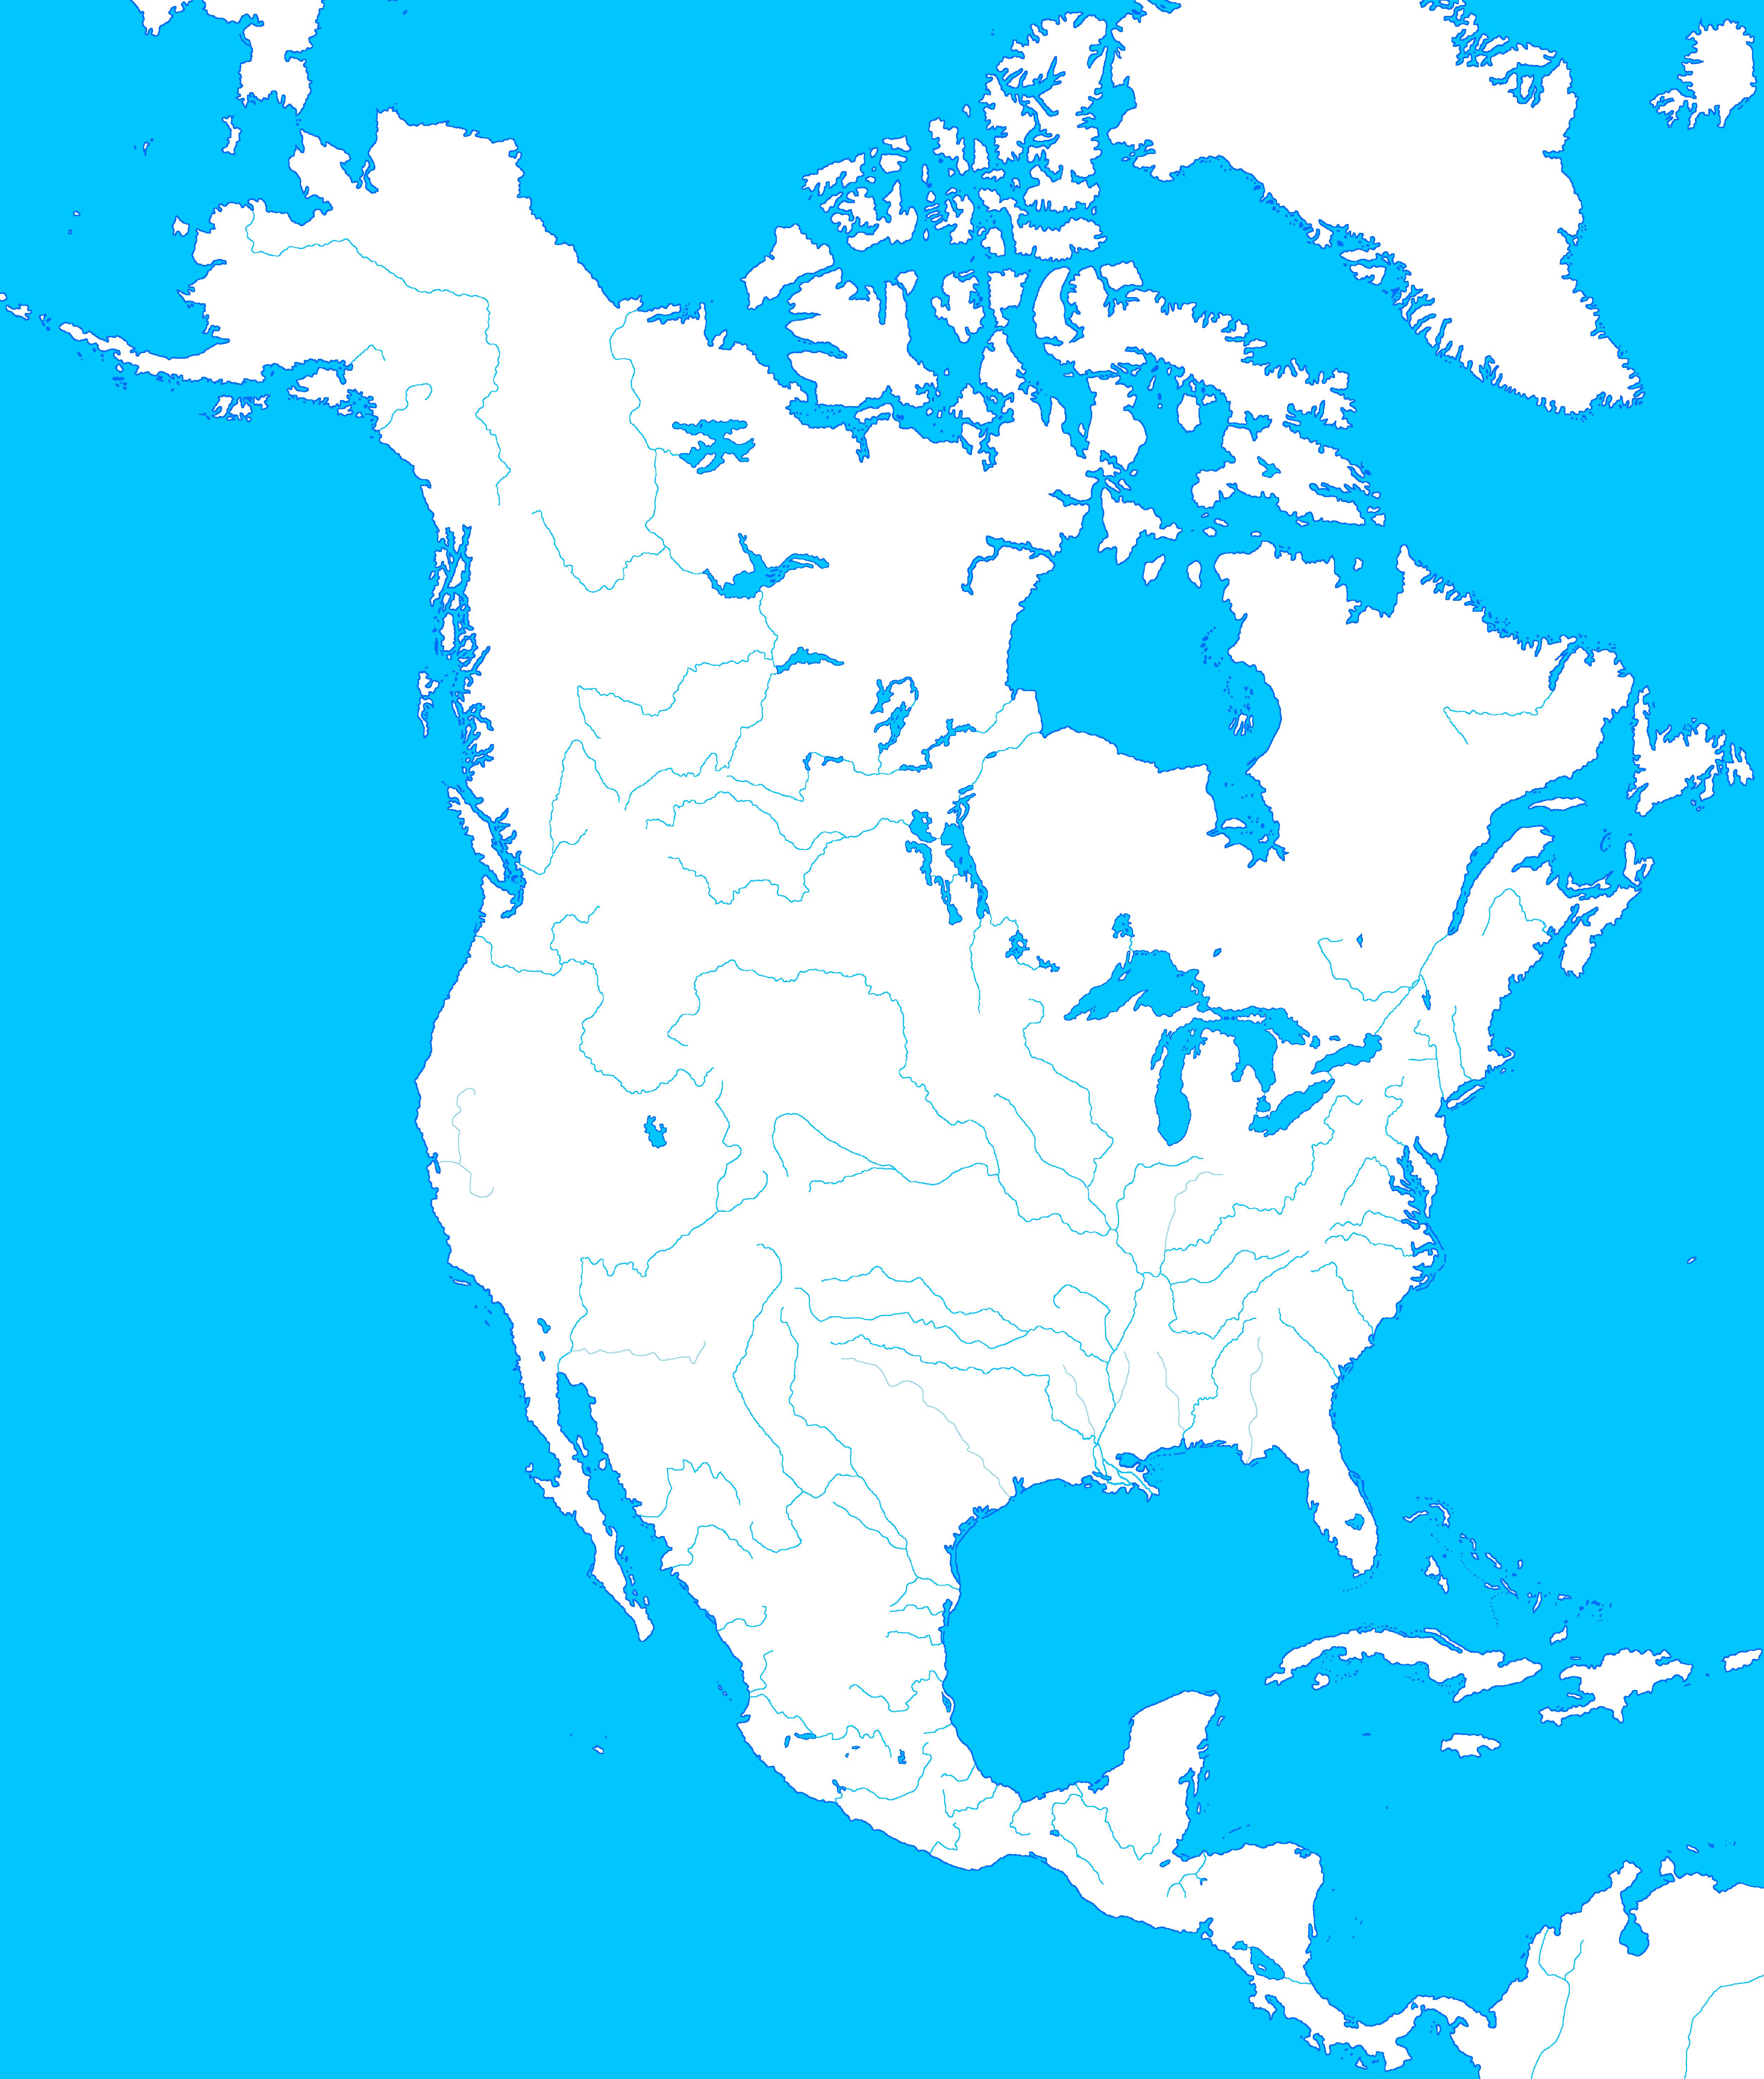 Blankmapdirectoryallofnorthamerica Alternatehistorycom Wiki - America map with rivers